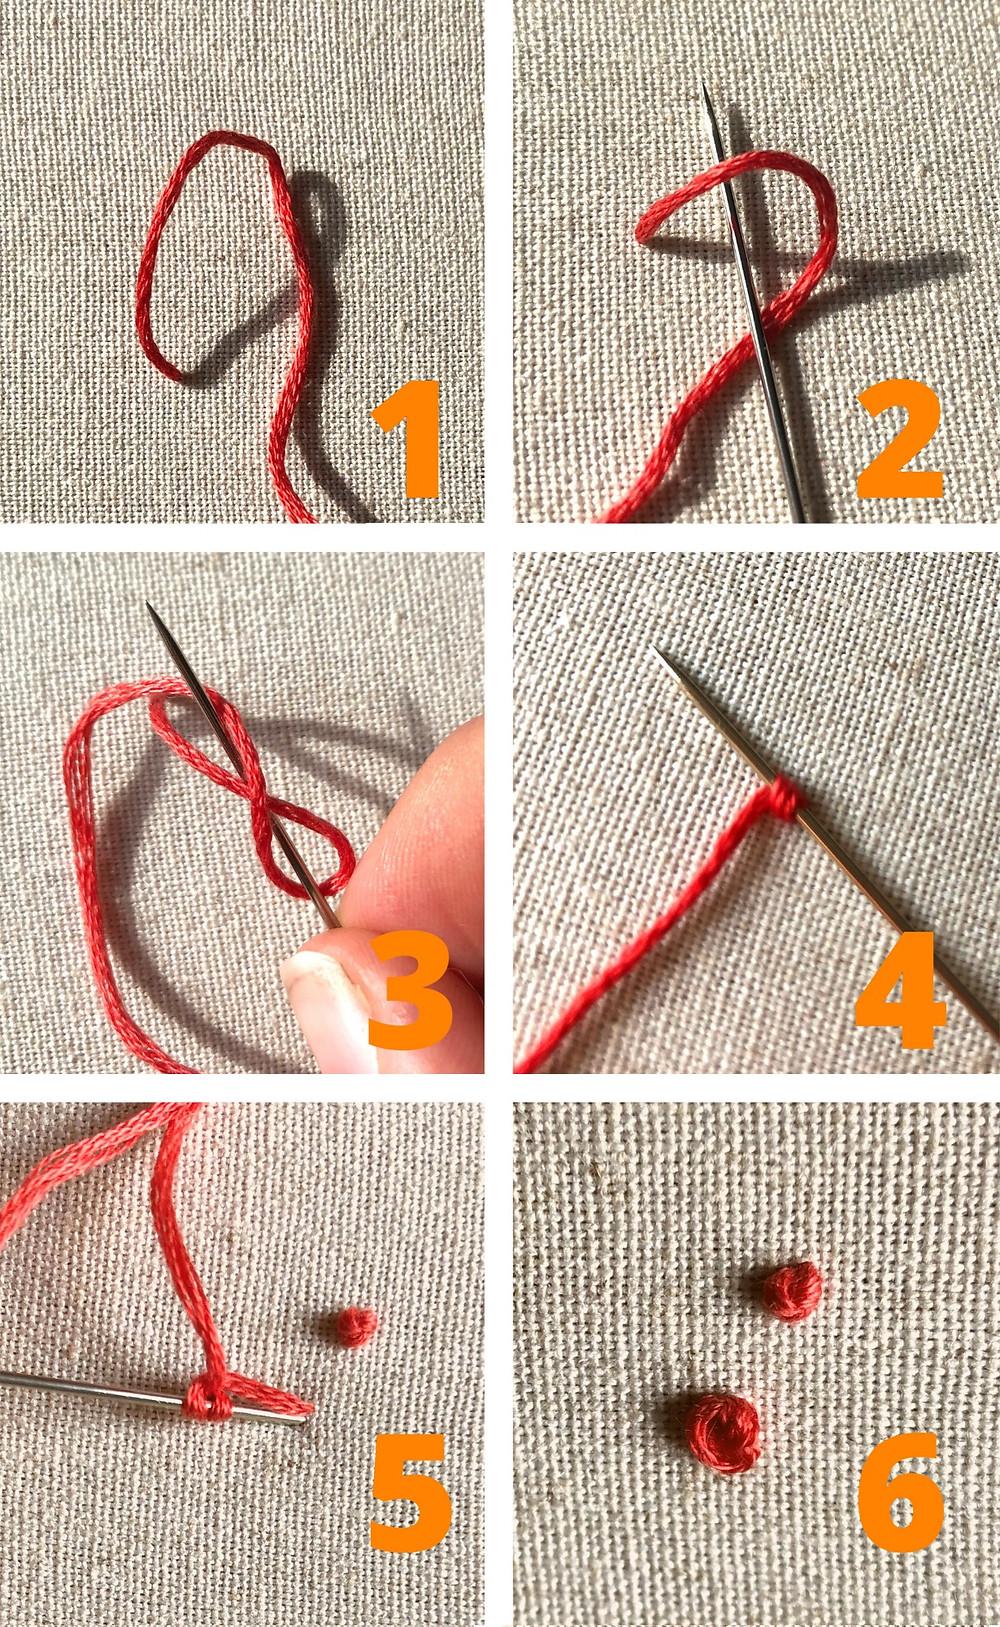 Borduursteek french knot uitgelegd